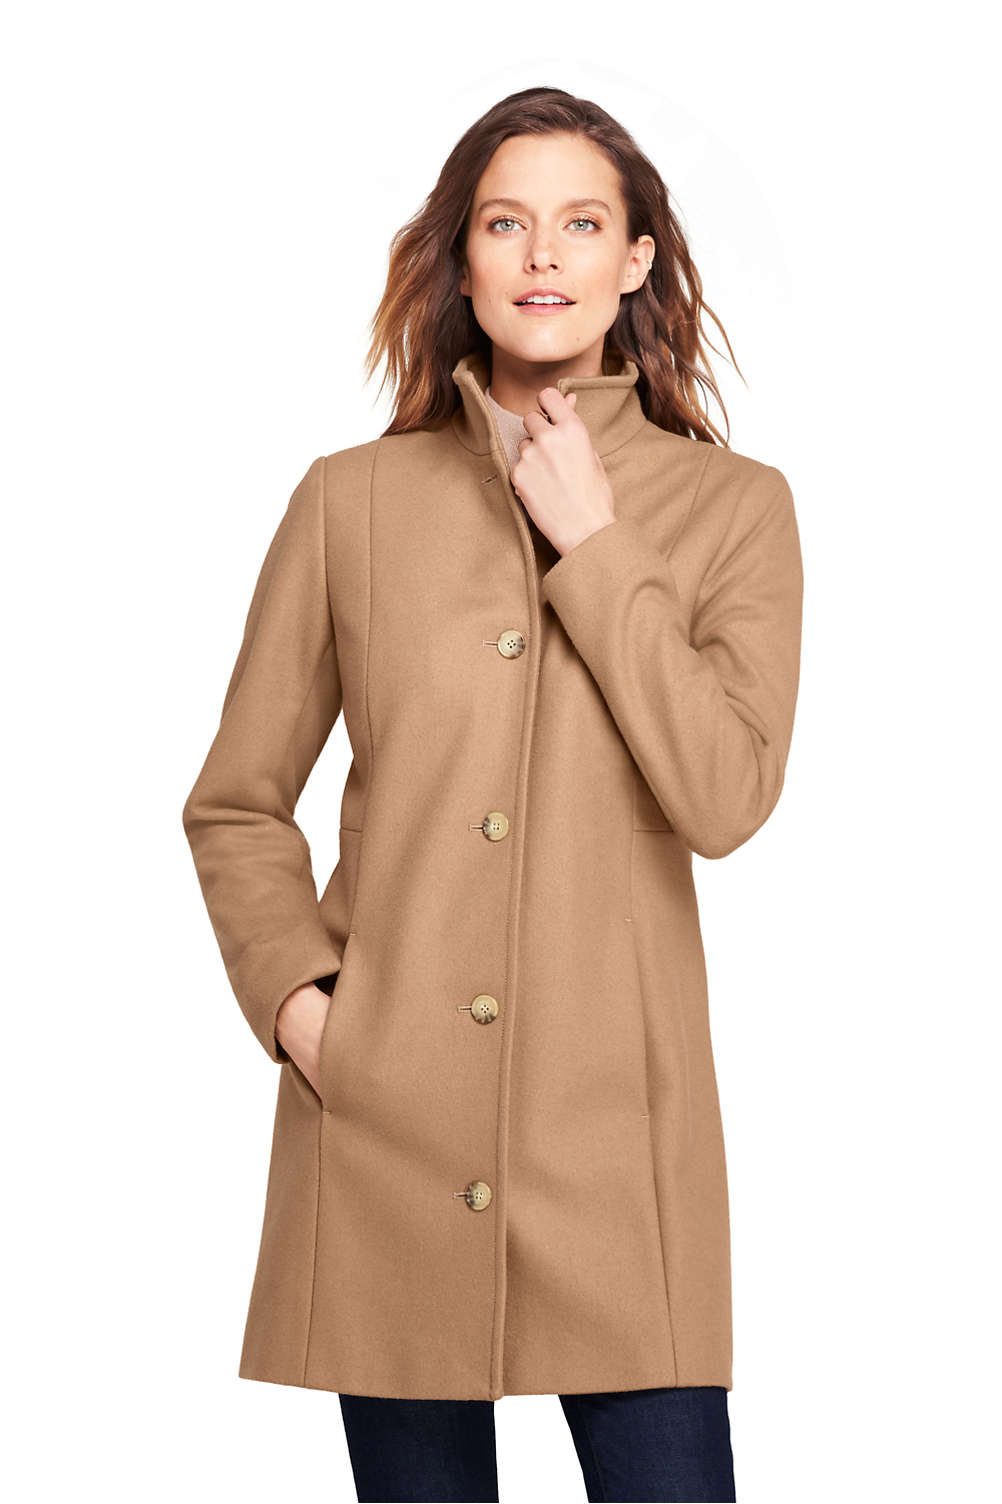 c5f4a5bda72 Women s Fit and Flare Long Wool Coat. Item  503353AH1. View Fullscreen